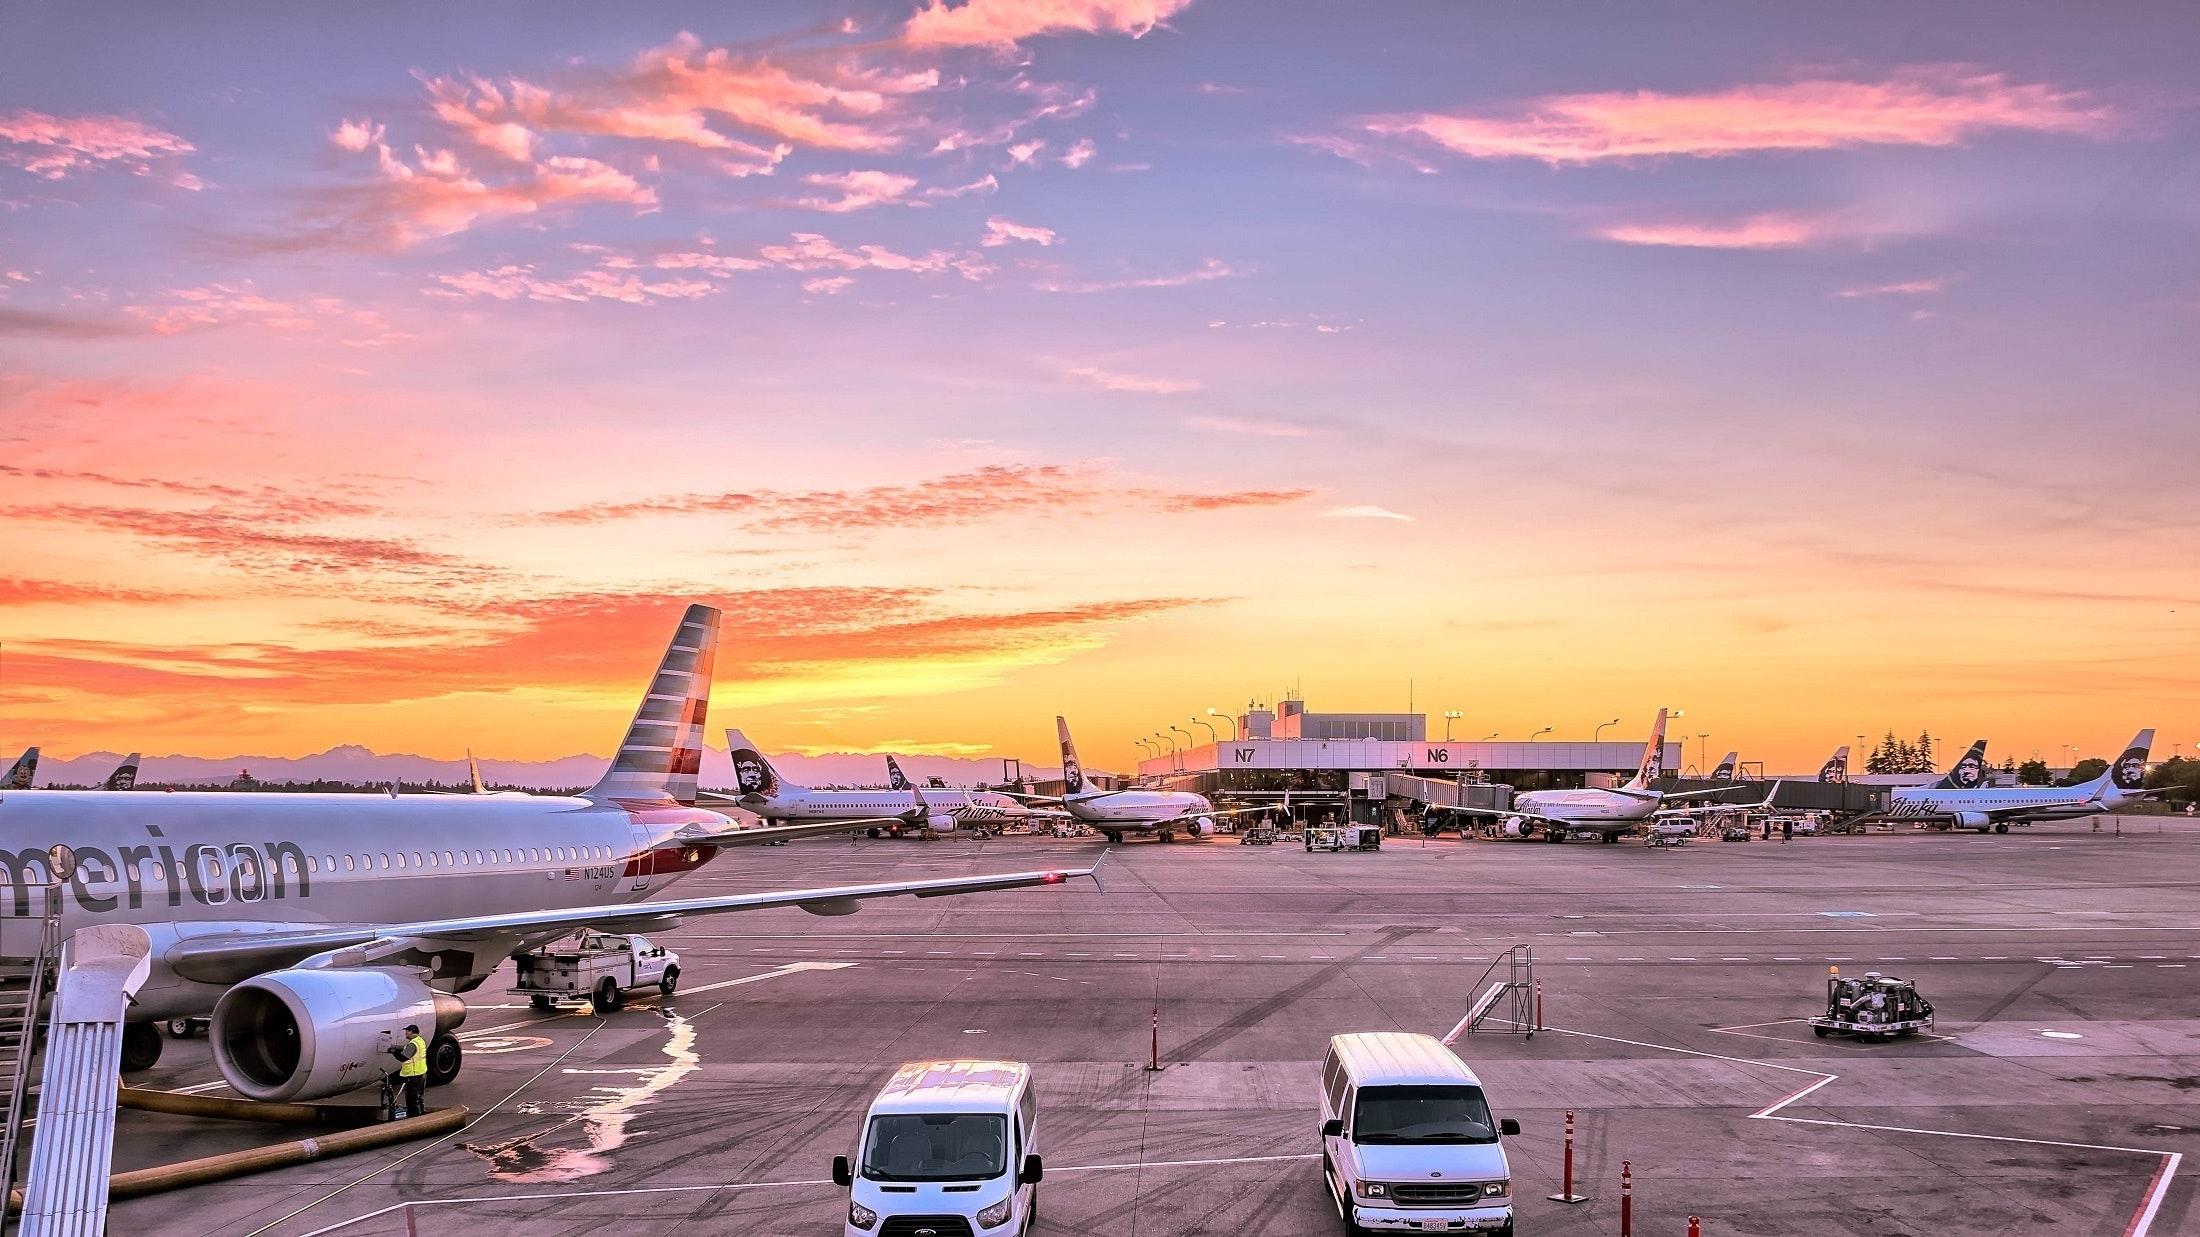 Яндекс очередь в аэропортах